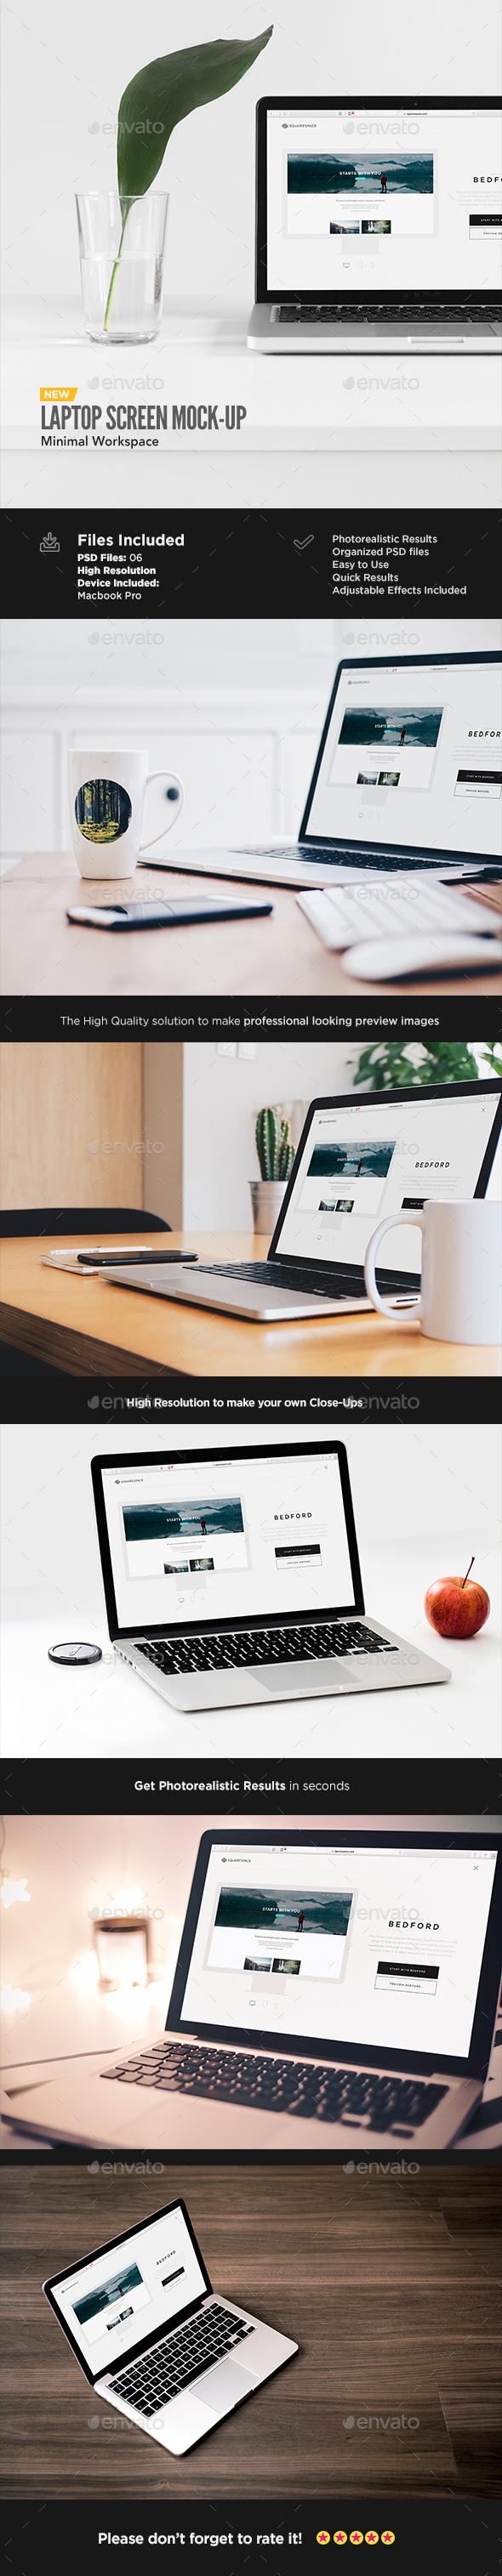 Laptop Display Mock-Up | Workspace Edition - Displays Product Mock-Ups